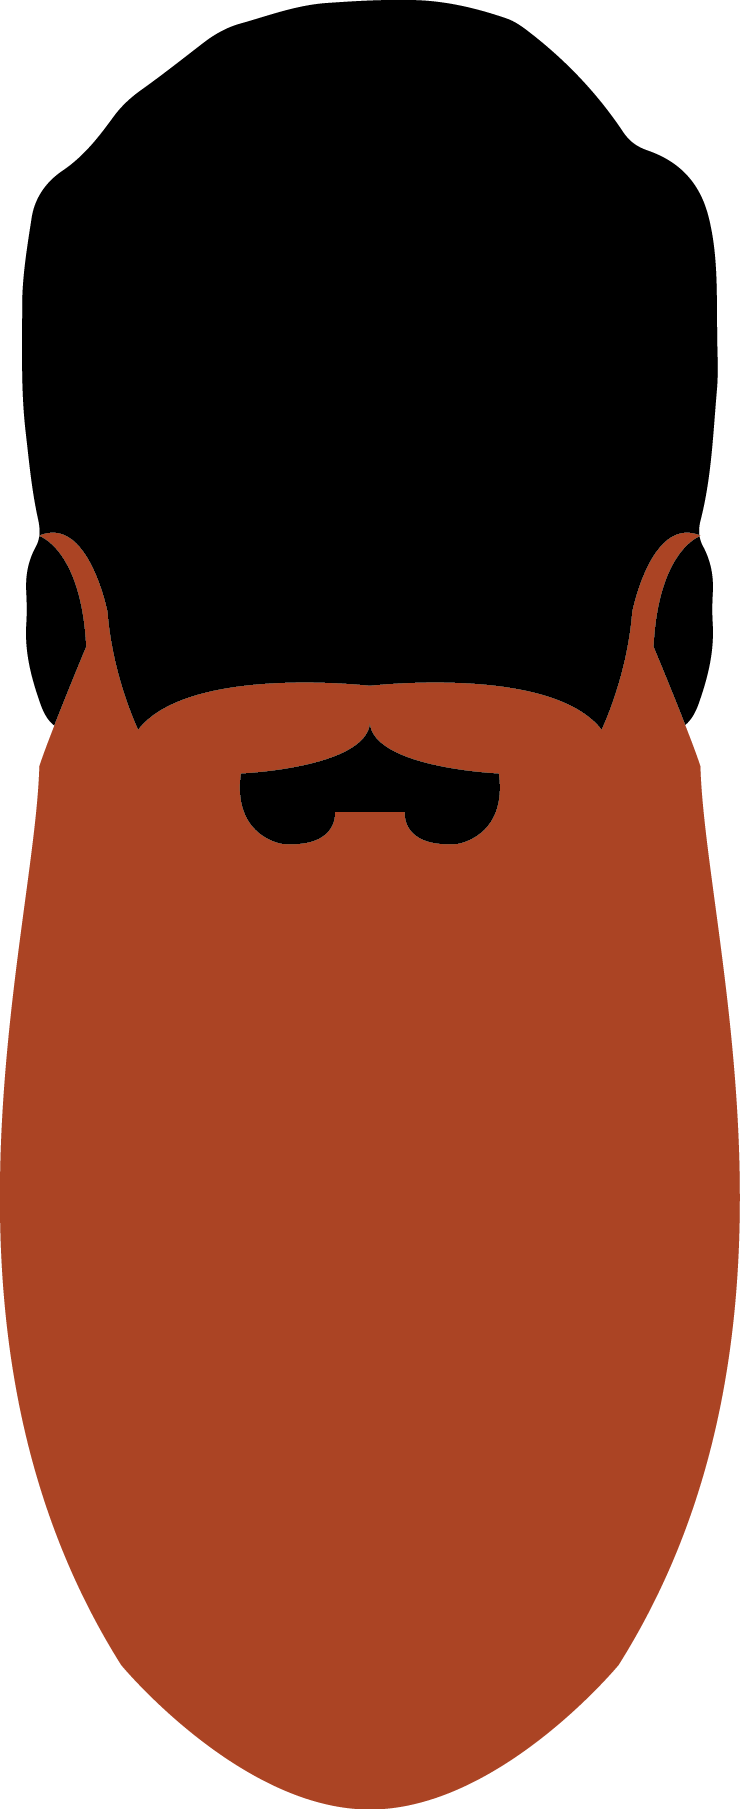 Austin facial hair club. Moustache clipart short beard